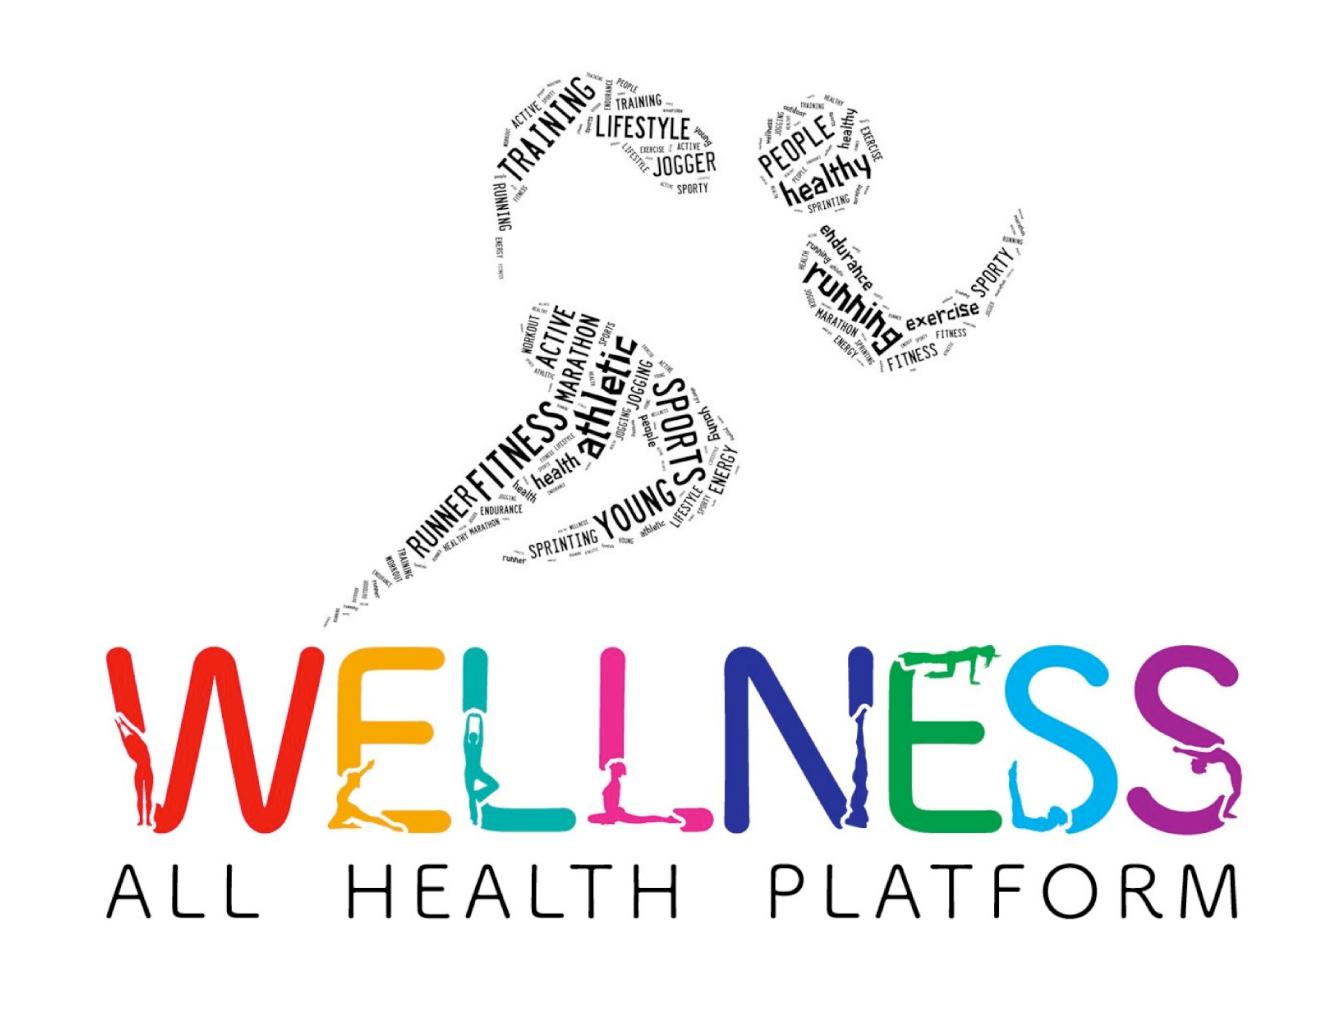 WELLNESS ALL HEALTH PLATFORM